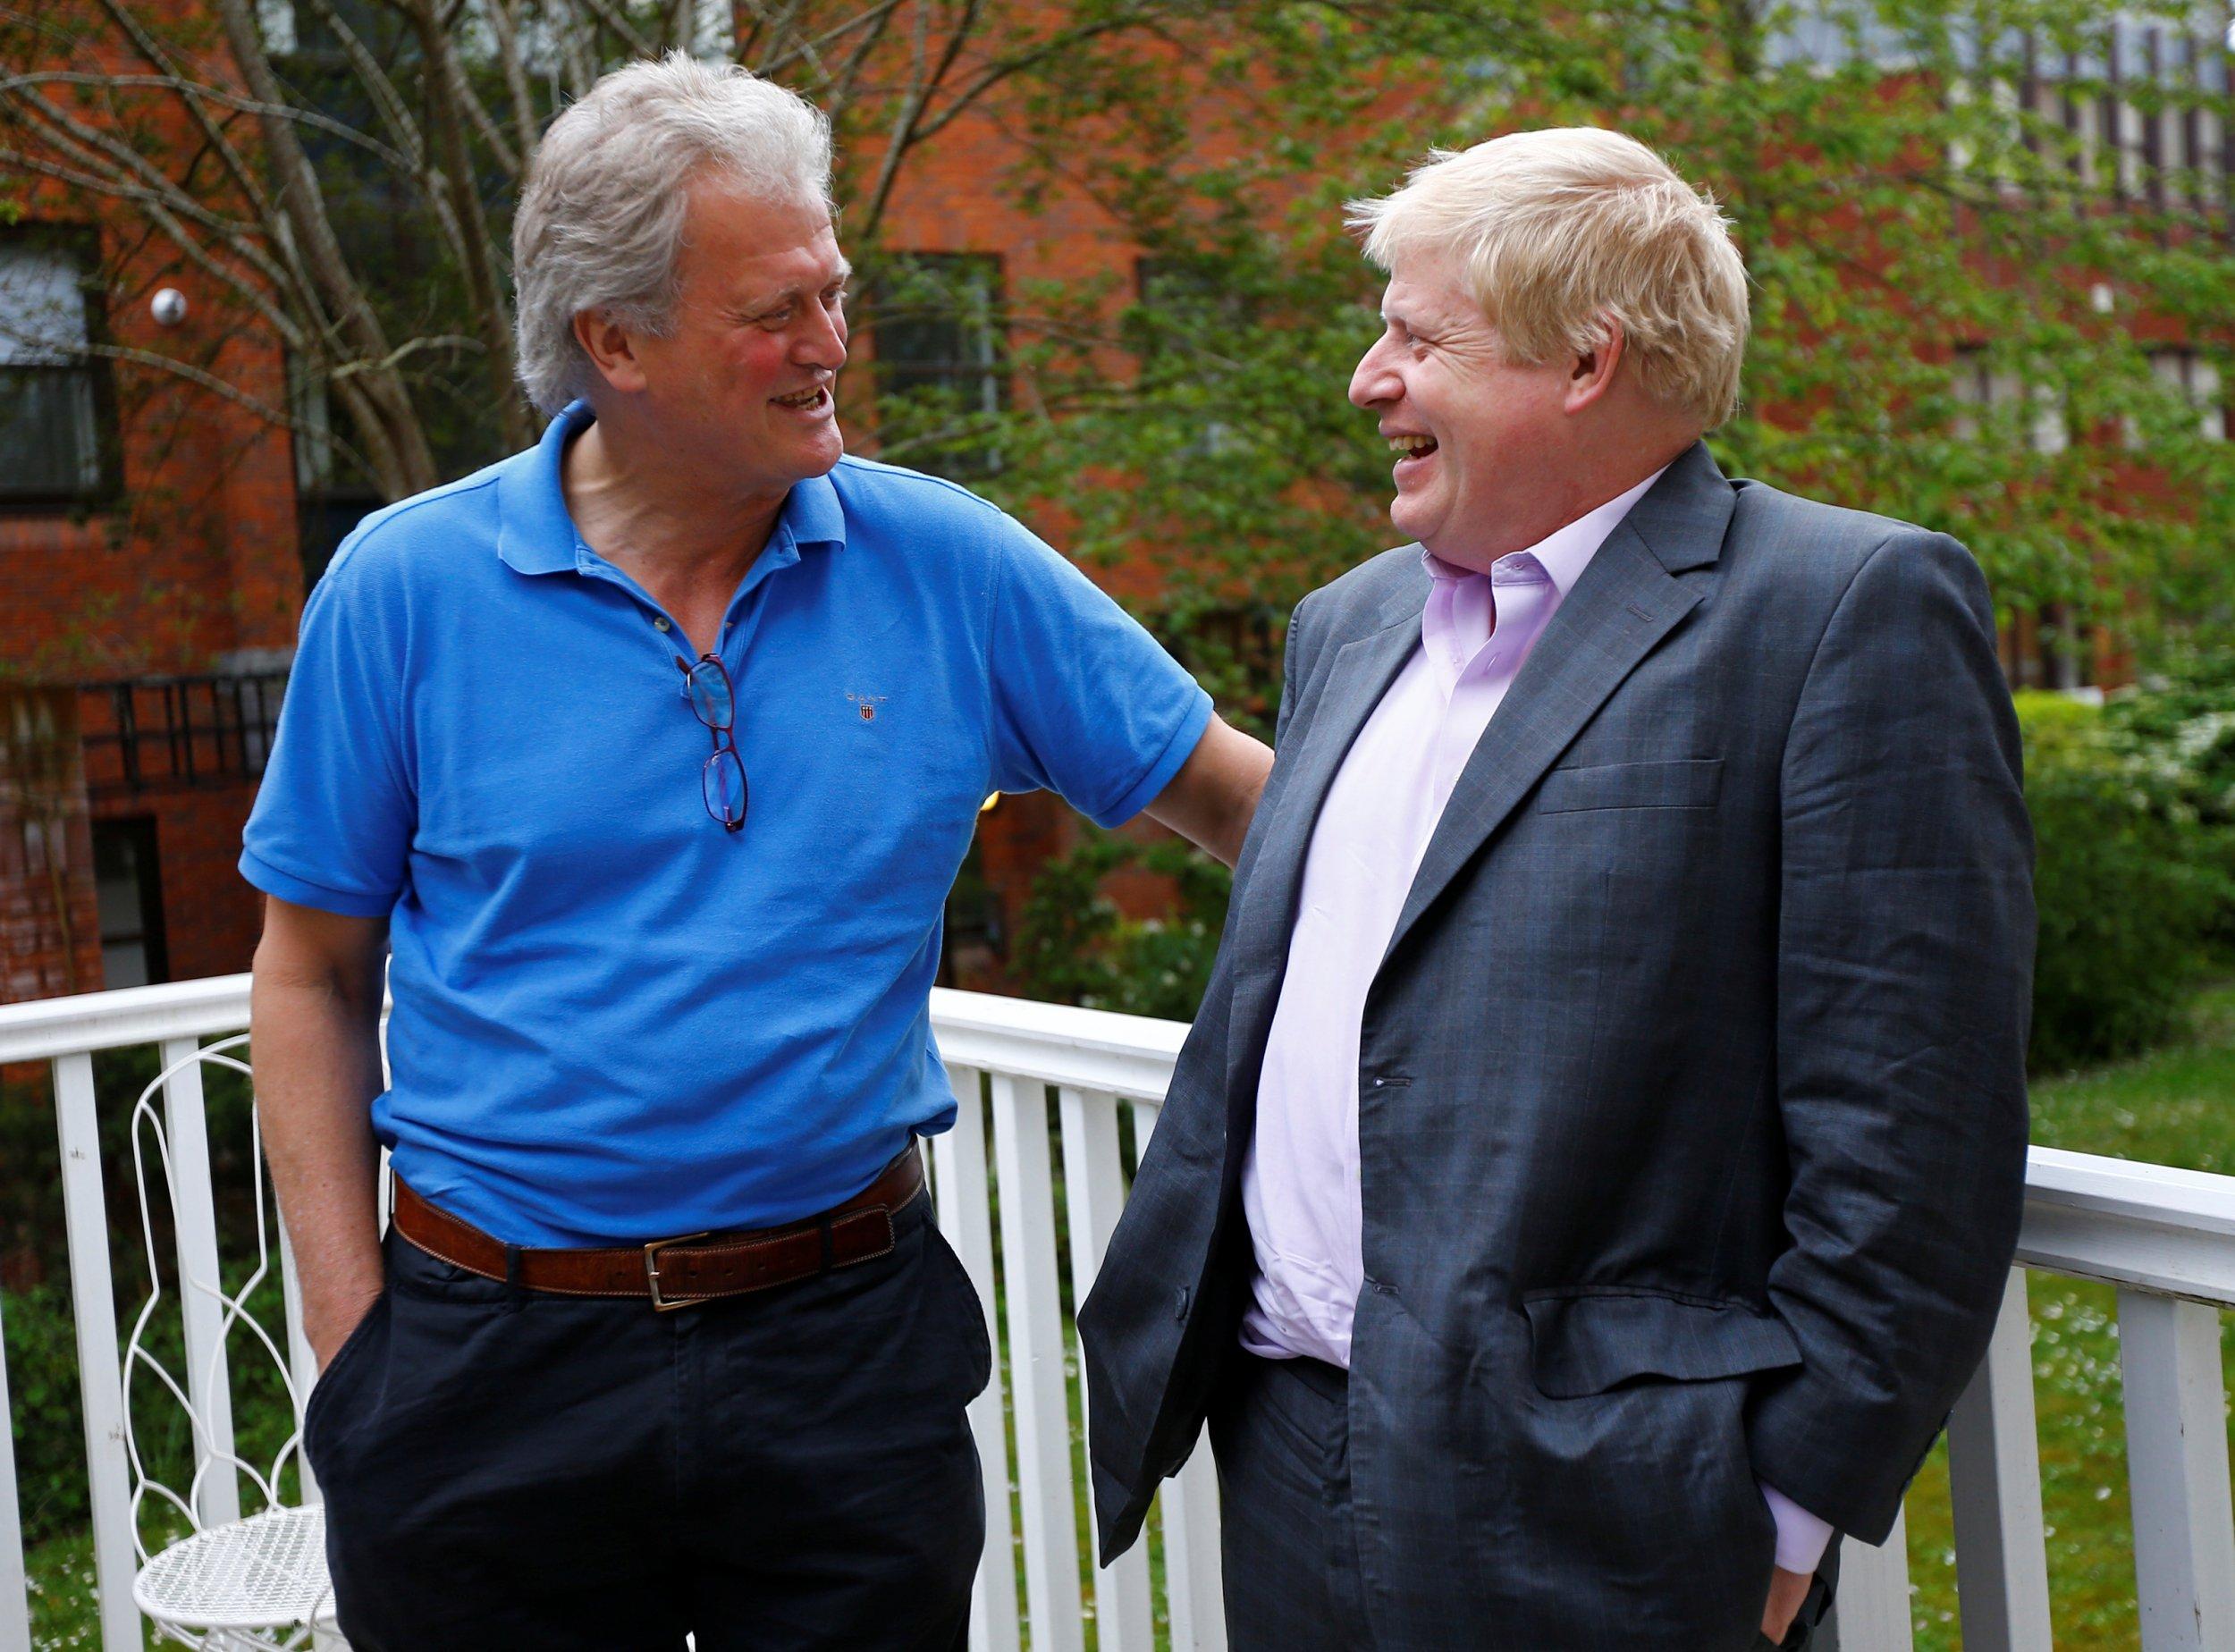 Tim Martin (L) and Boris Johnson